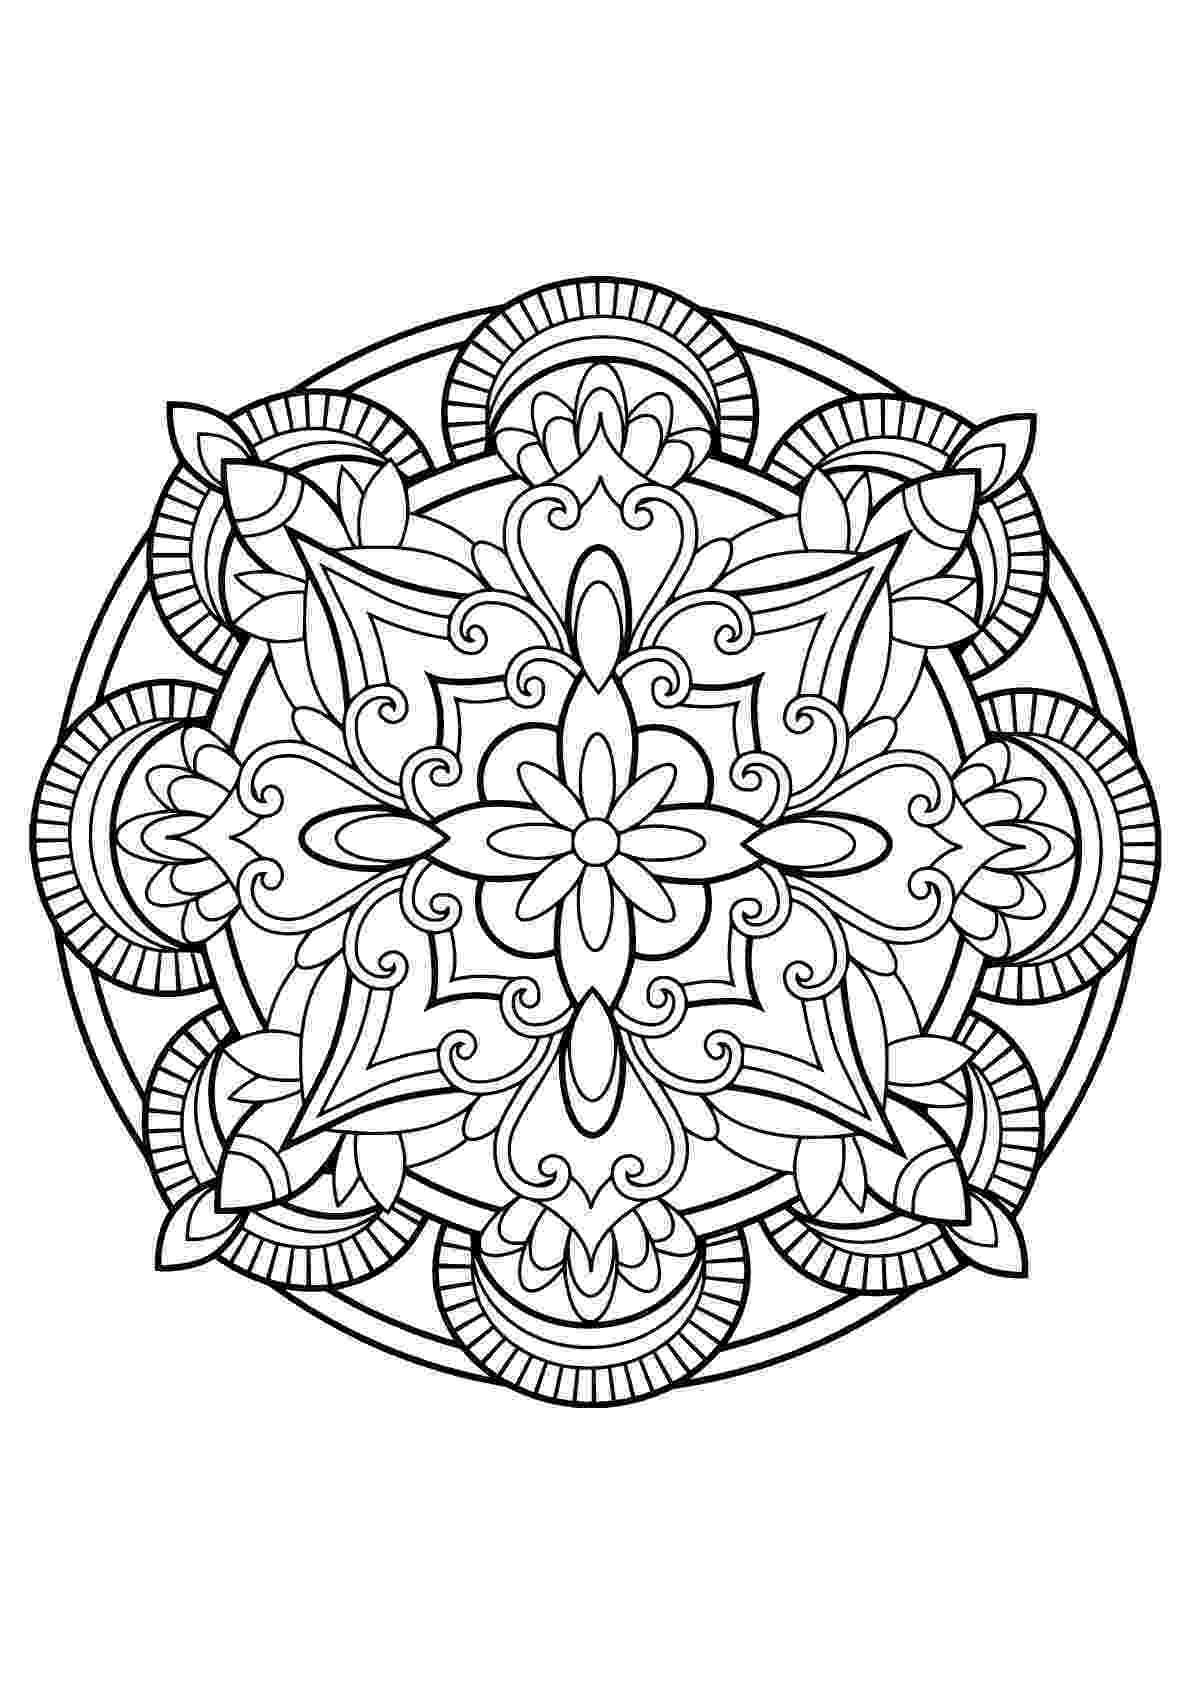 coloring mandalas for adults mandalas to color for children mandalas kids coloring pages adults coloring mandalas for